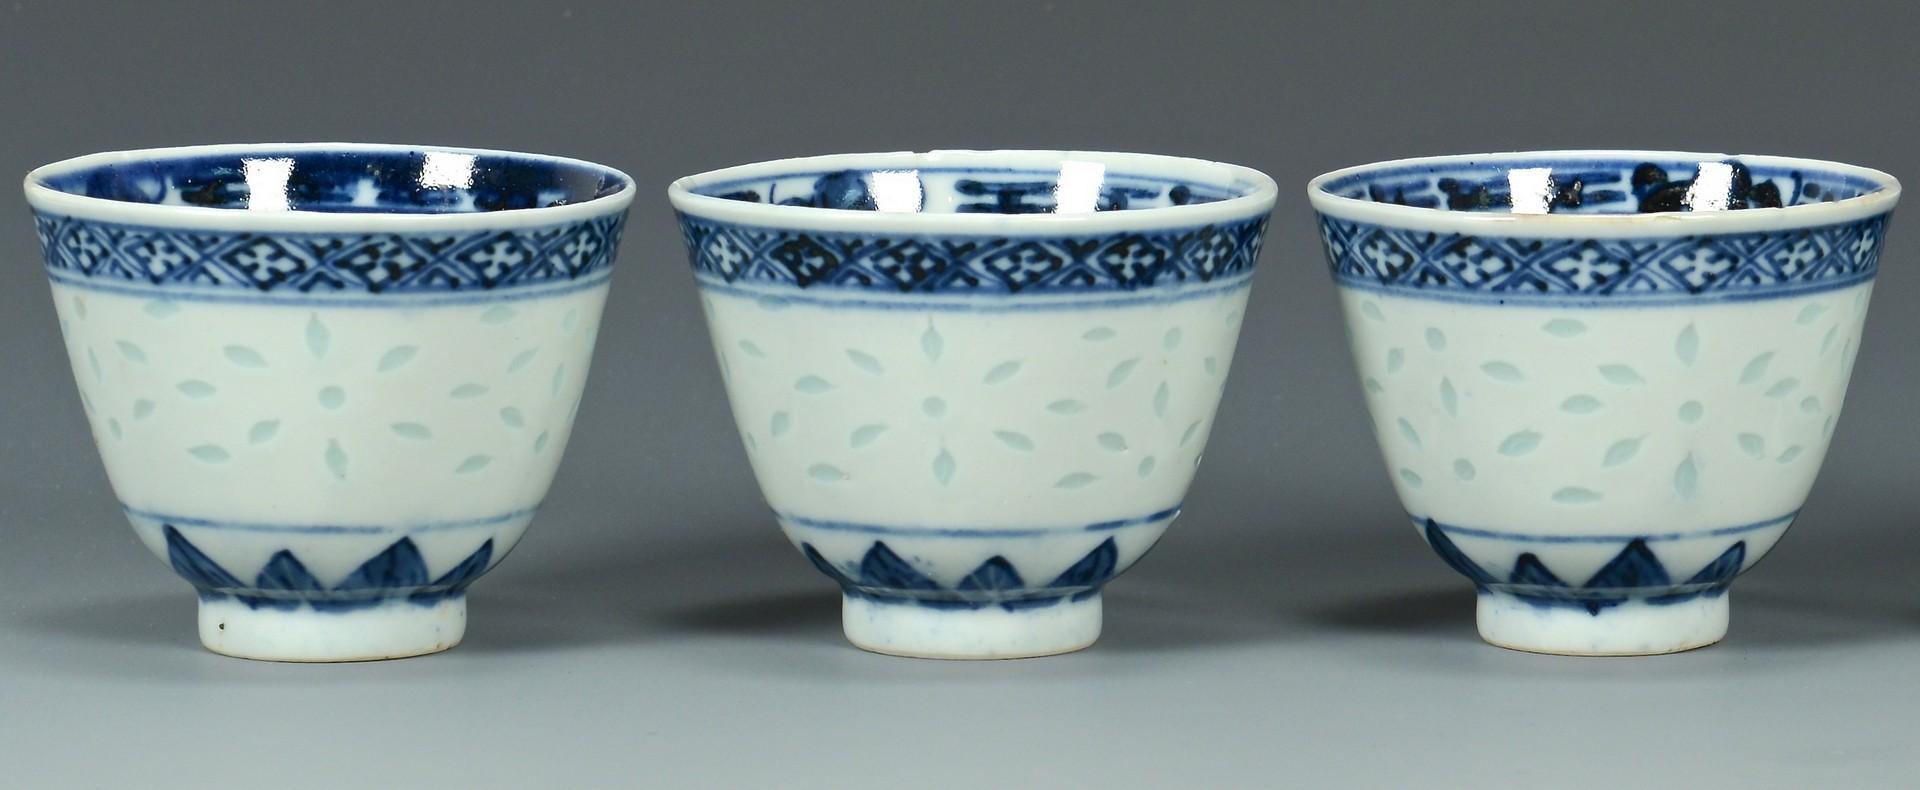 Lot 3594190: Group of Asian Decorative iItems, 10 pcs.